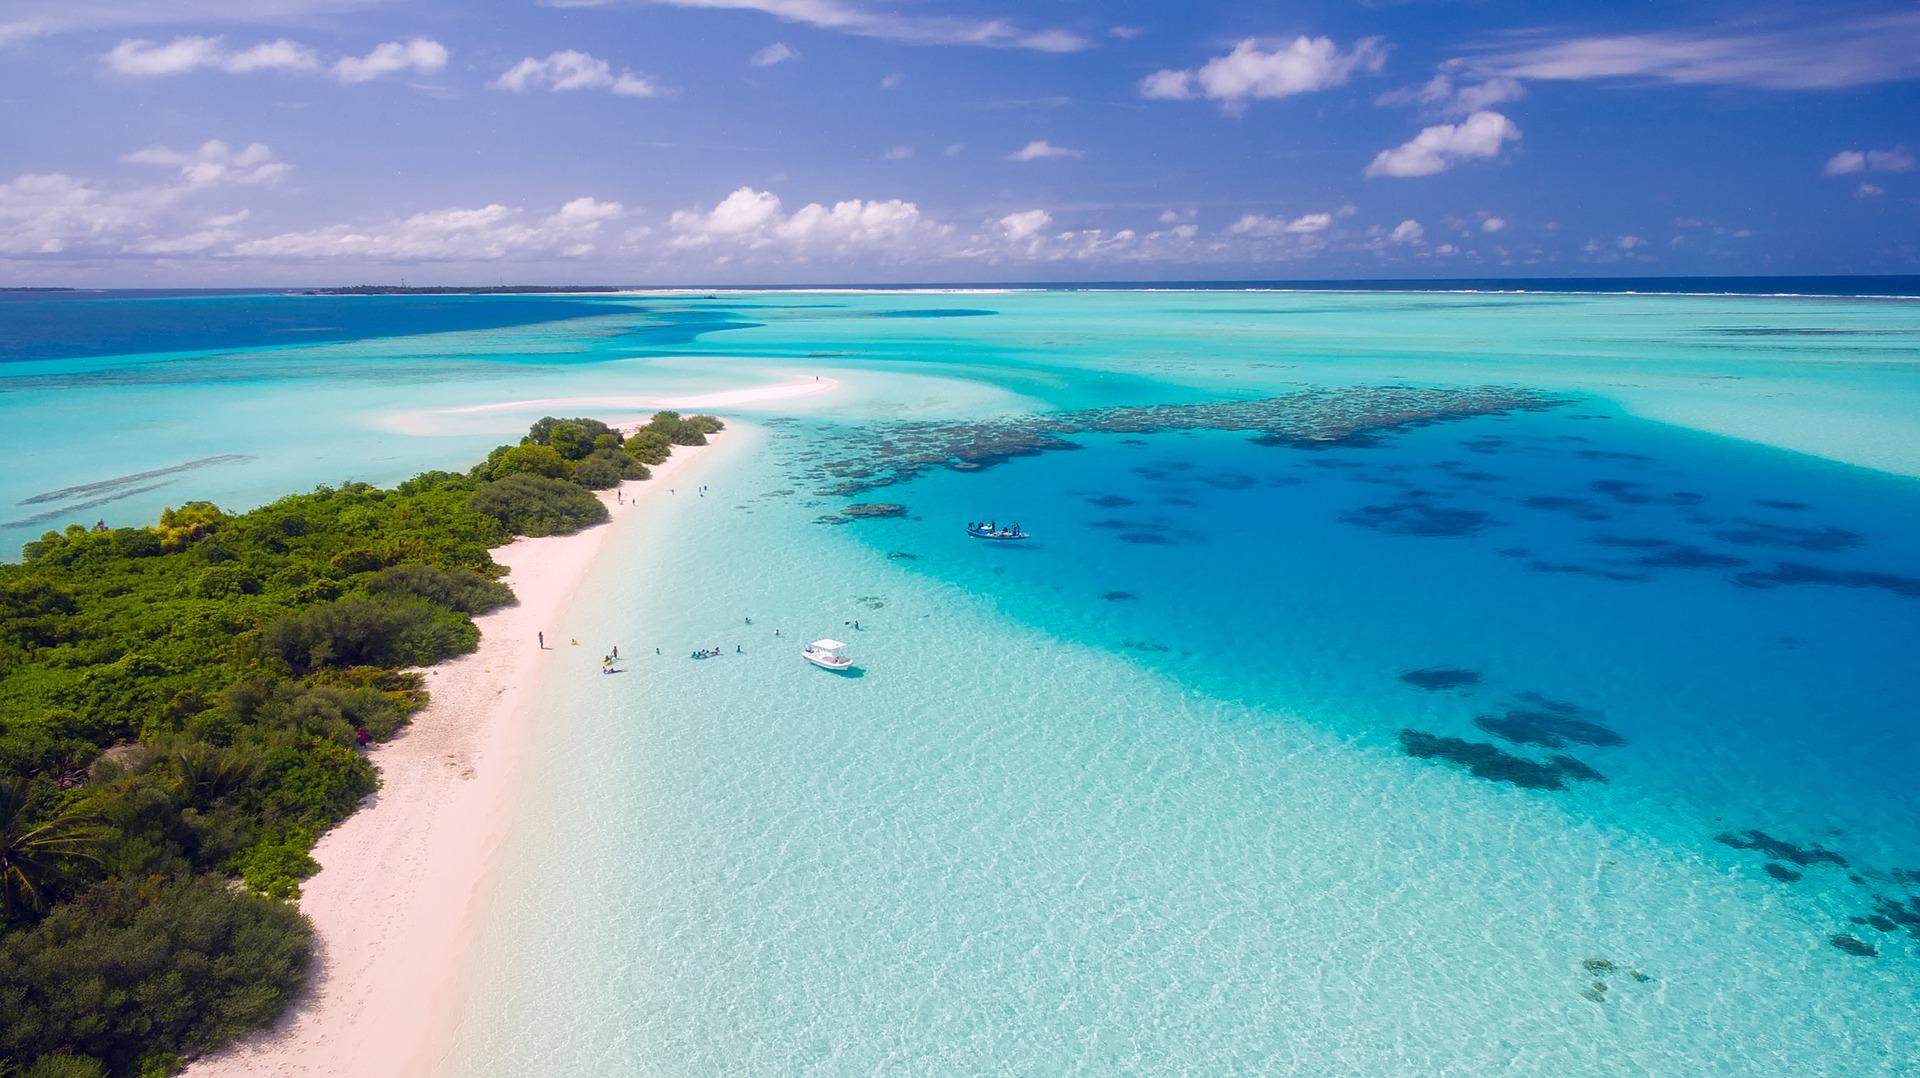 maldives-1993704_1920 (1).jpg